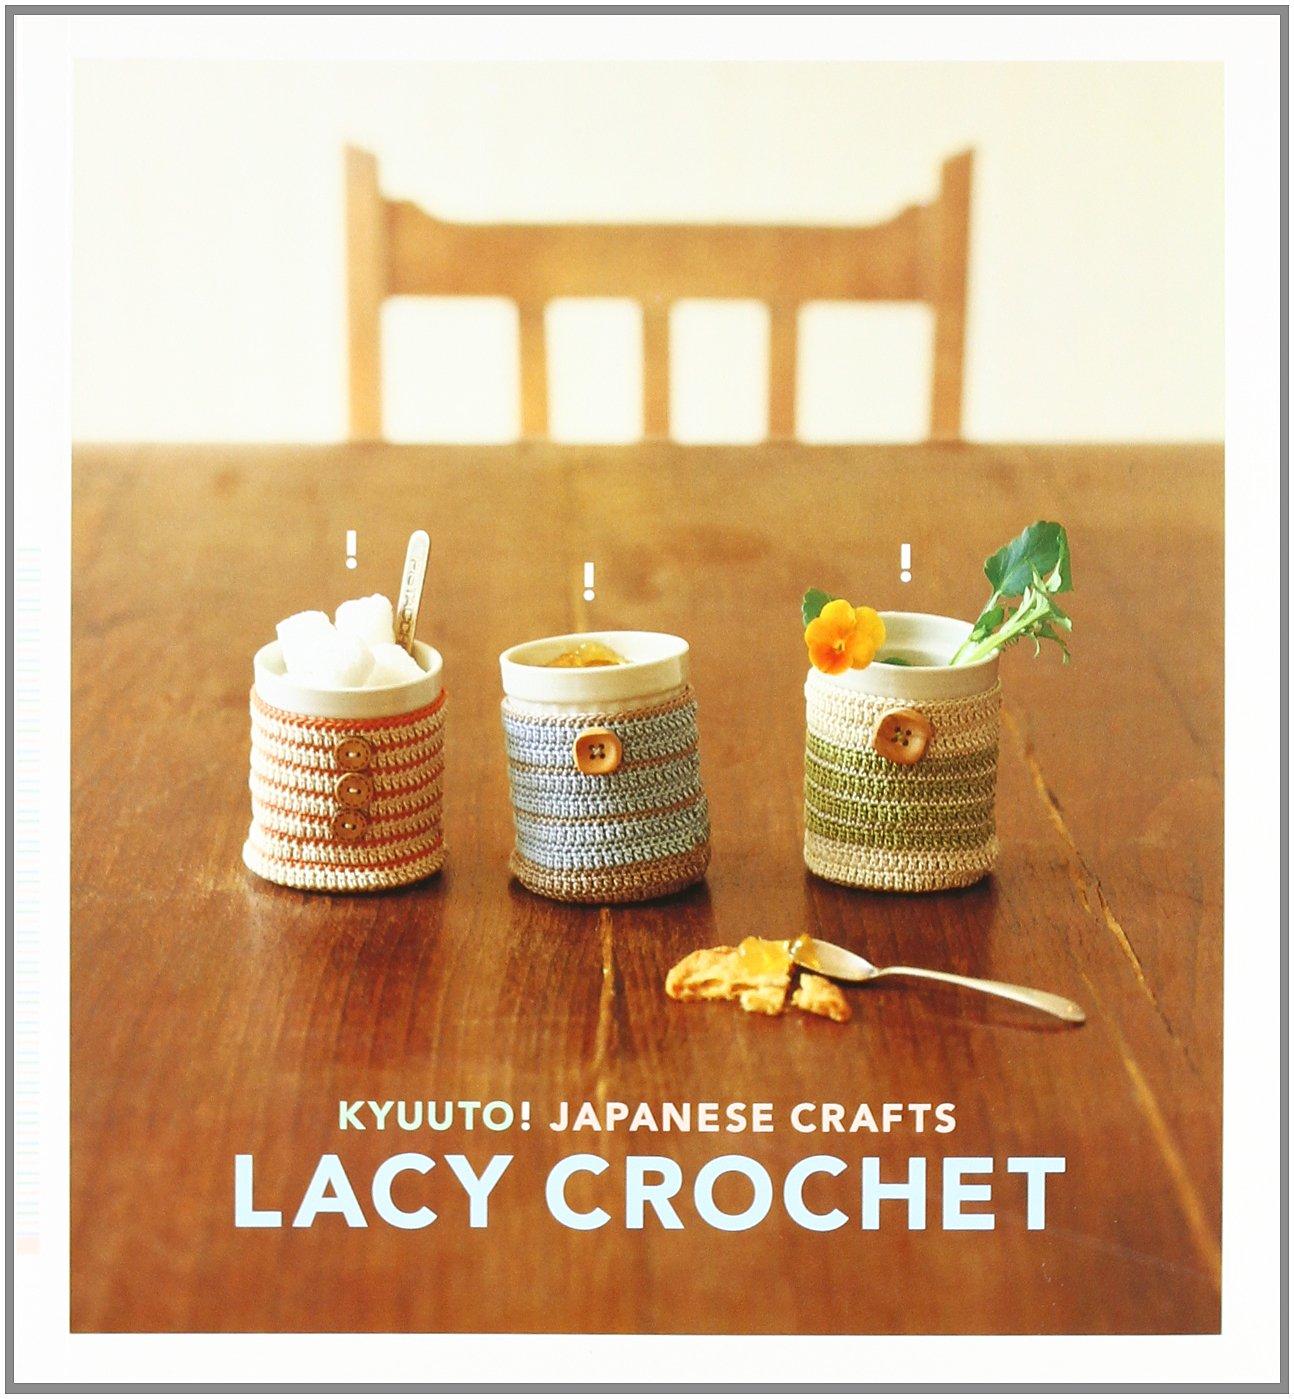 Kyuuto! Japanese Crafts! Lacy Crochet (Crafts): Amazon.co.uk: Chronicle  Books: 9780811860581: Books